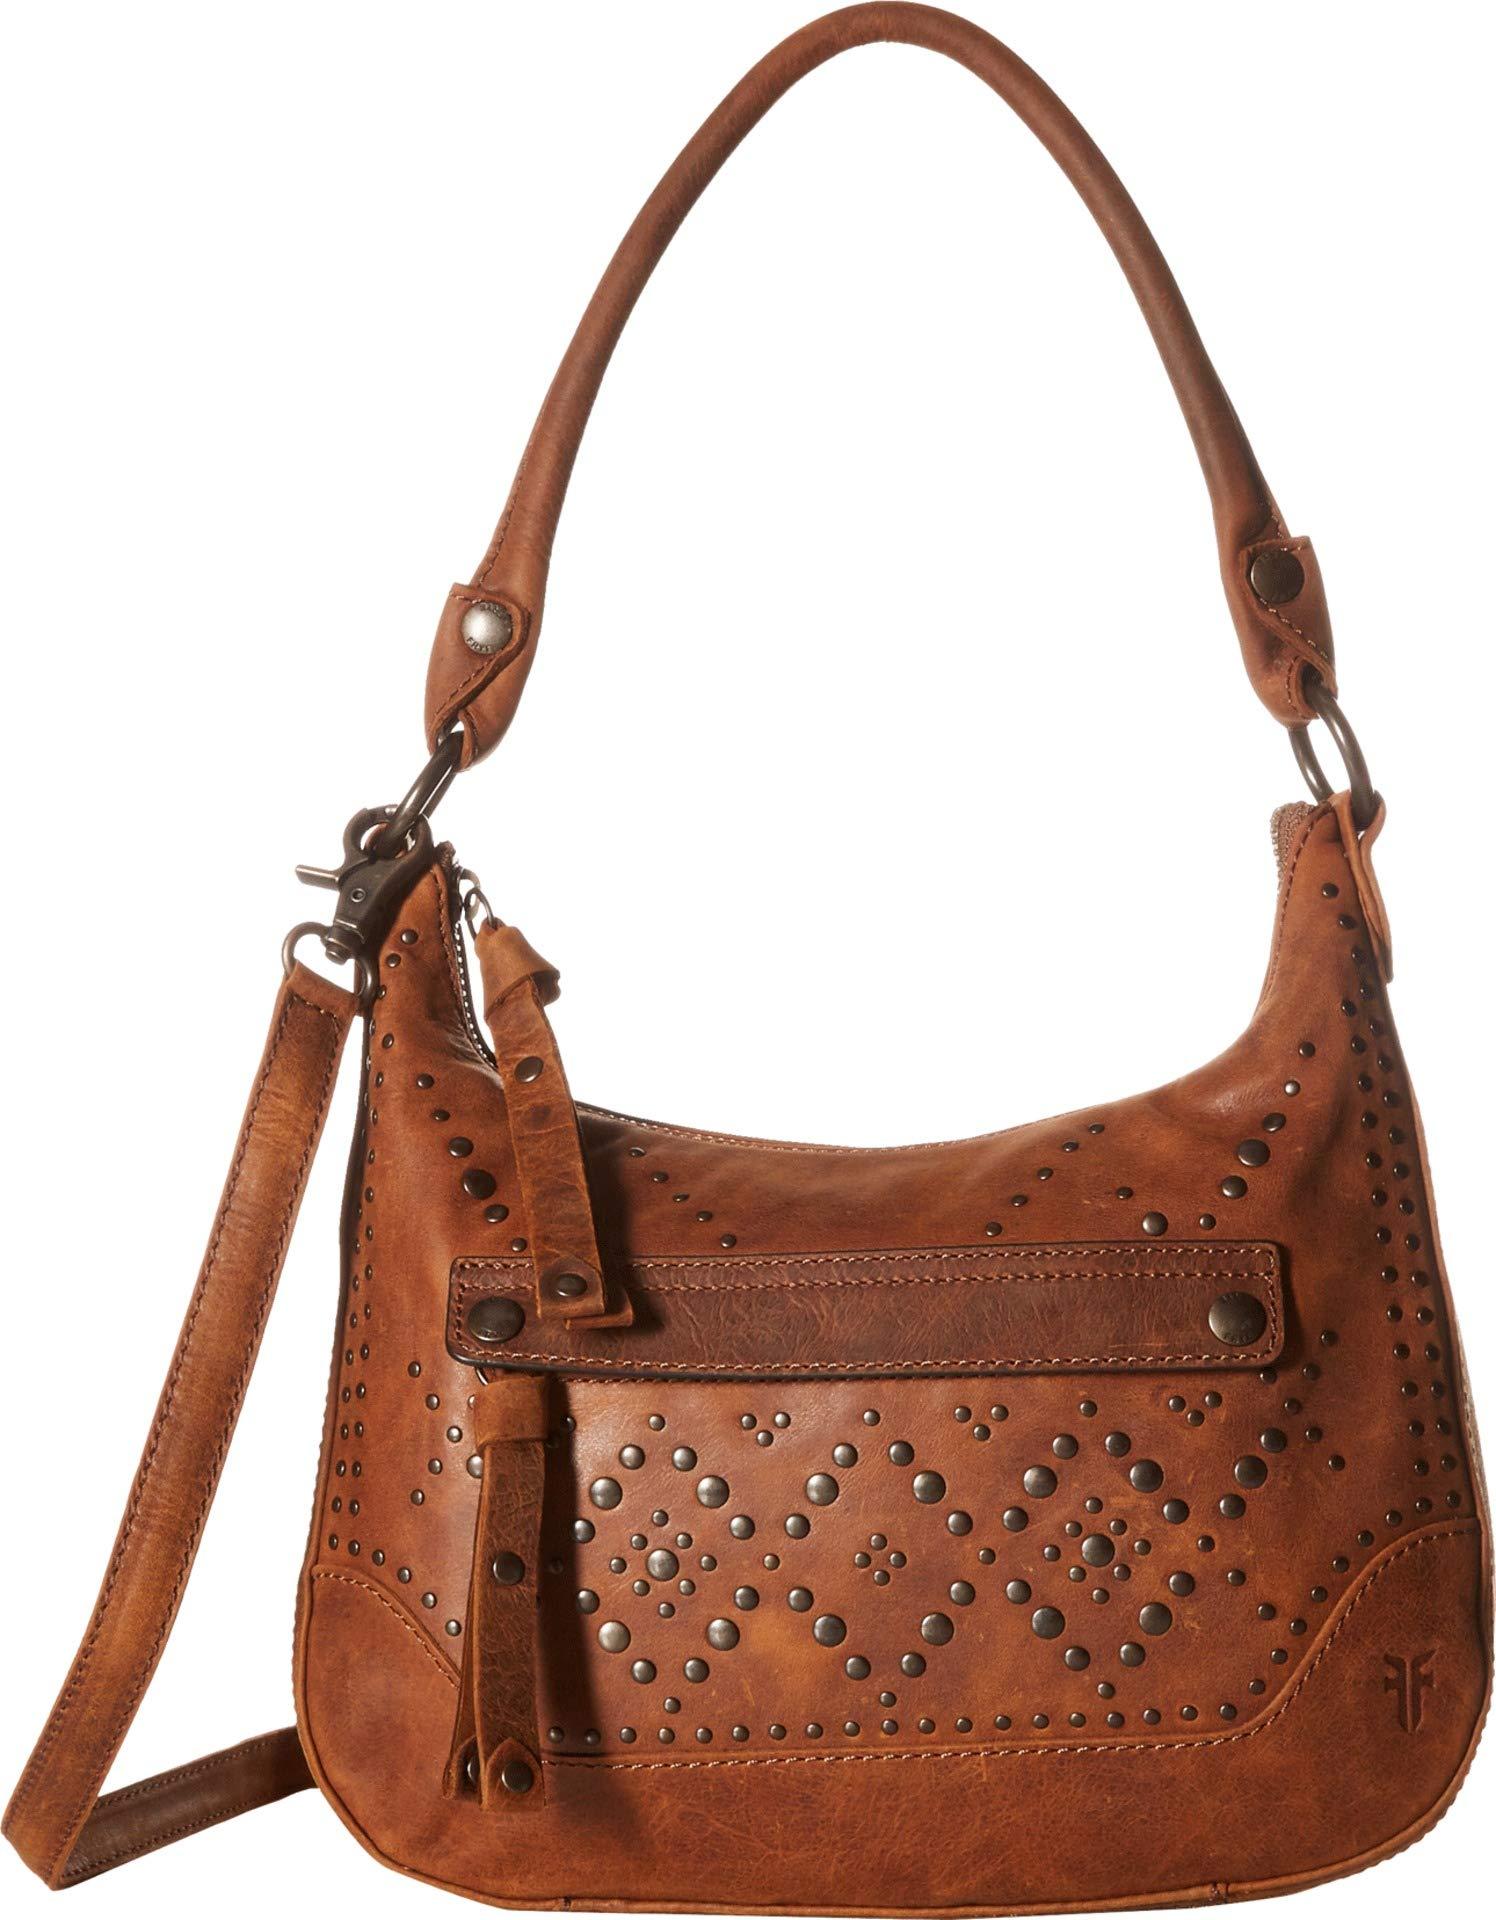 FRYE Melissa Studded Zip Hobo Crossbody Handbag, brown